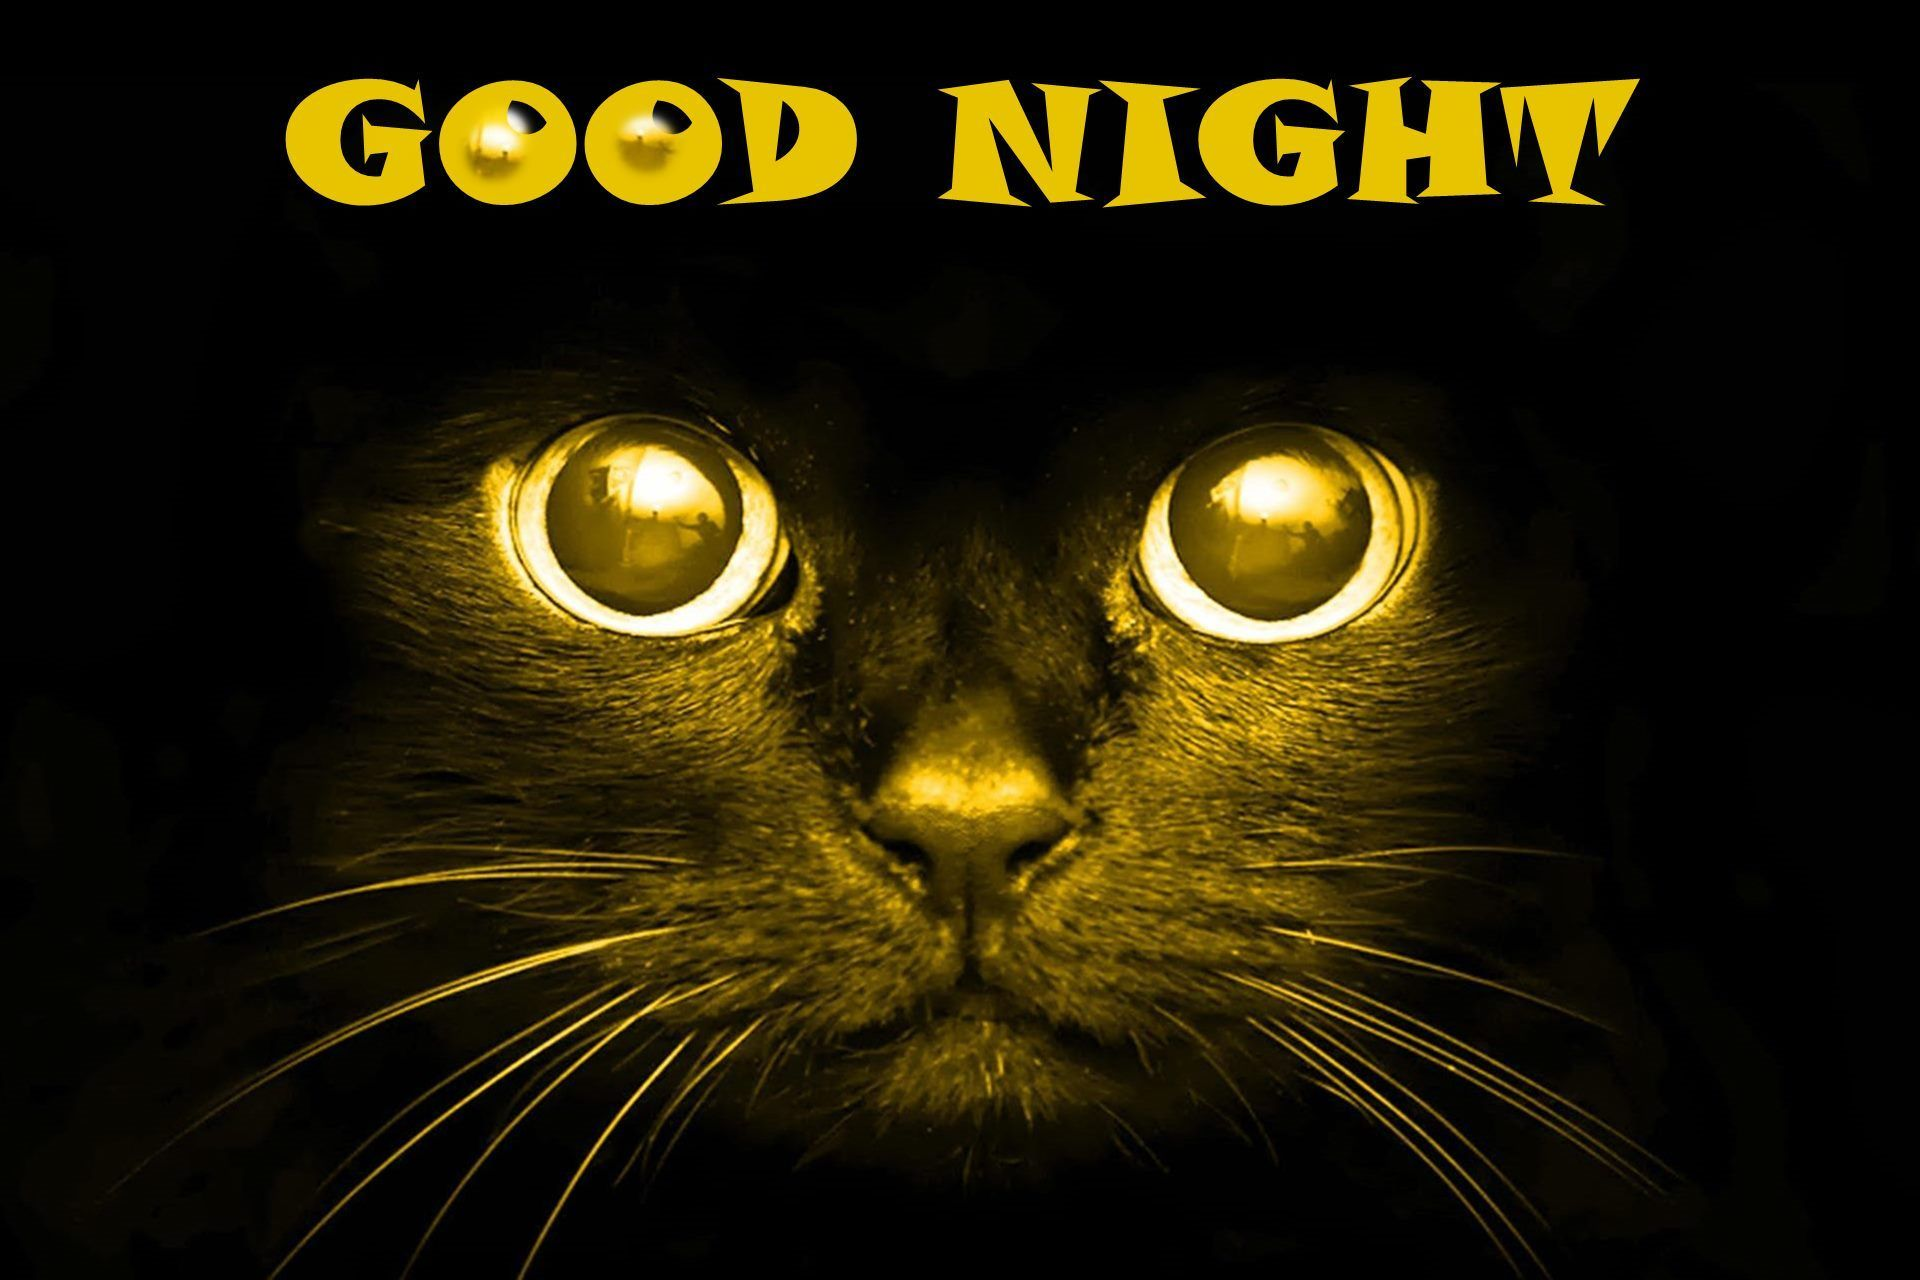 Black Cat Good Night Good Night Scary Cat Black Background Hd Wallpaper 05875 Background Hd Wallpaper Scary Cat Good Night Cat